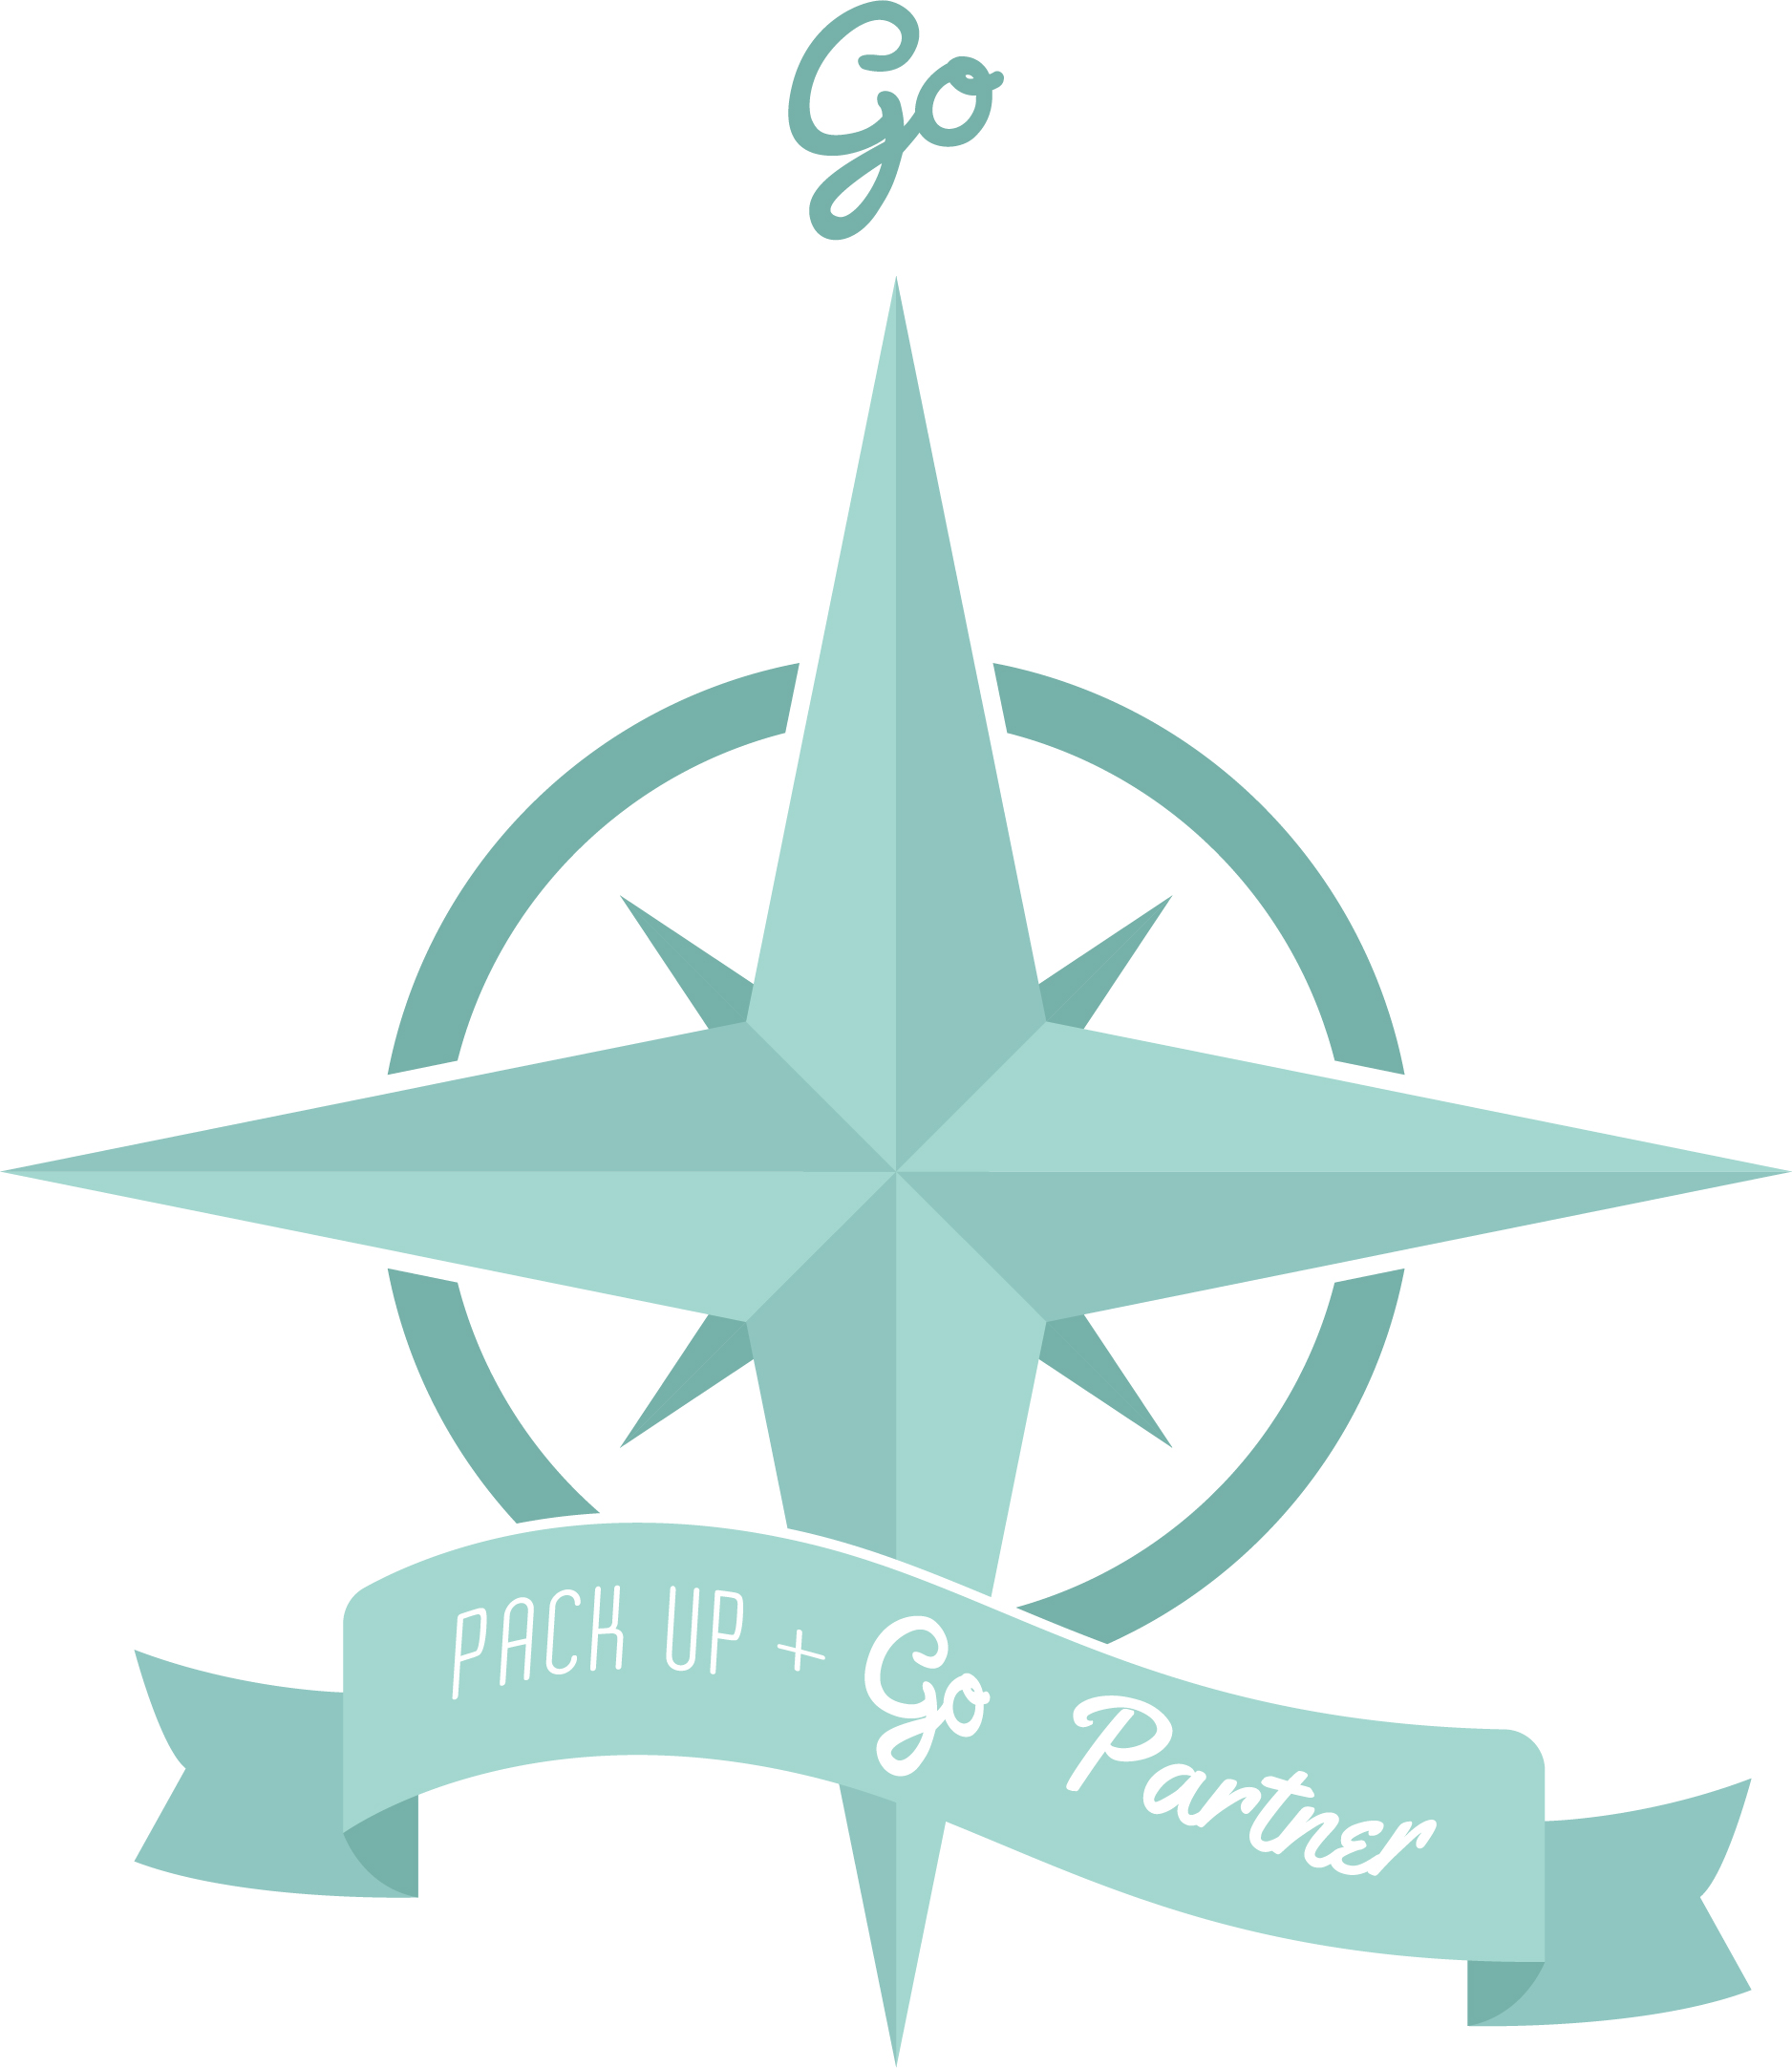 PU+G_partner_logo 2.jpg